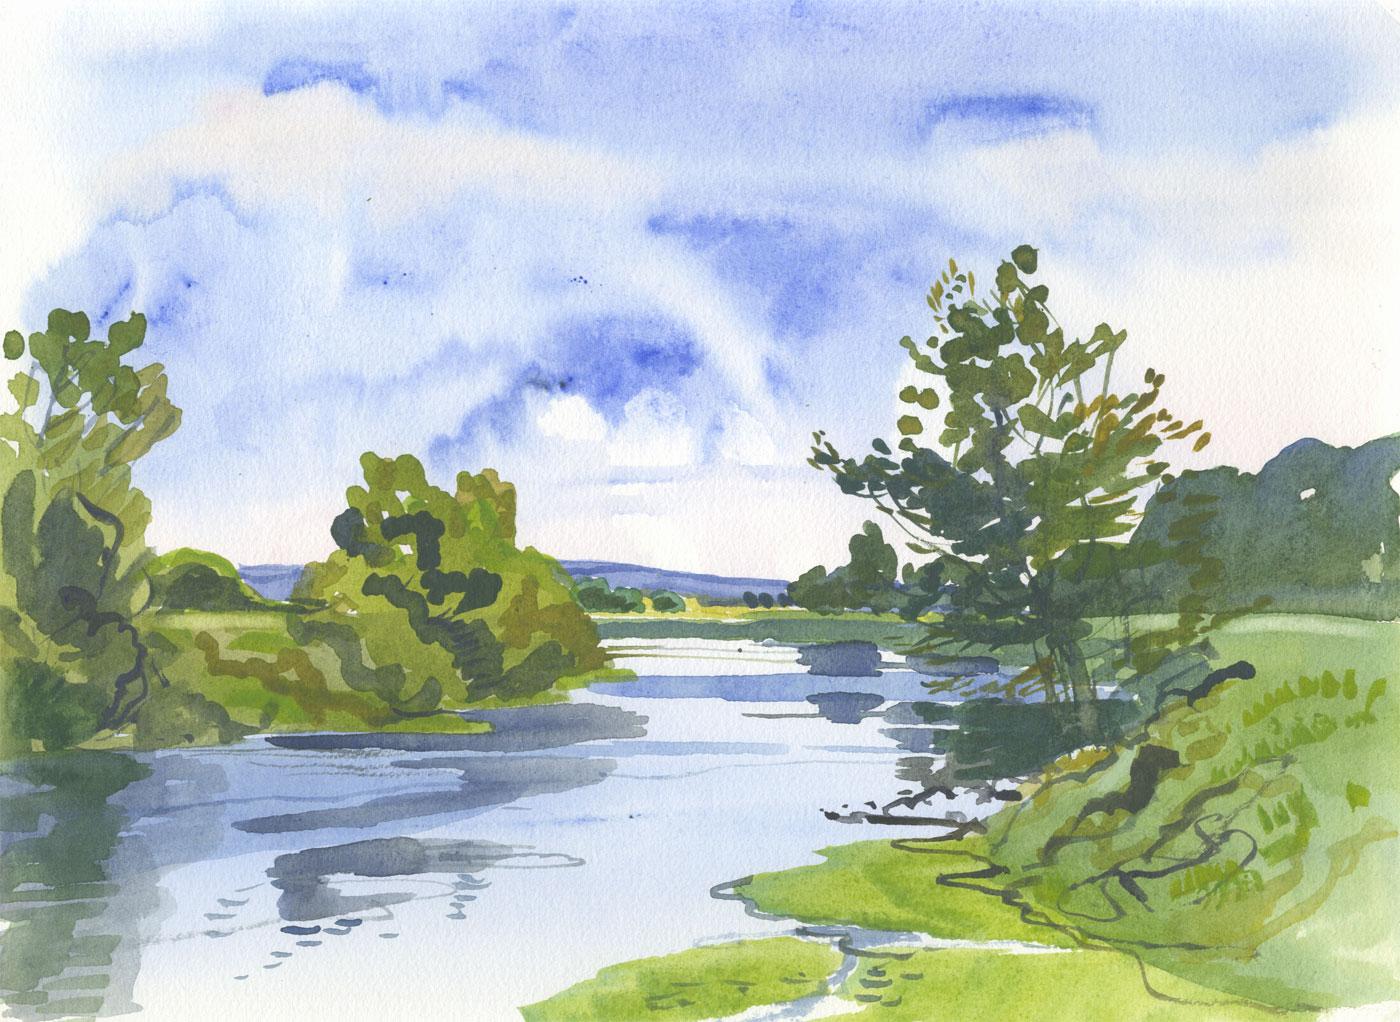 Robert T. Blayney (1929-2016) - Mid 20th Century Watercolour, River View